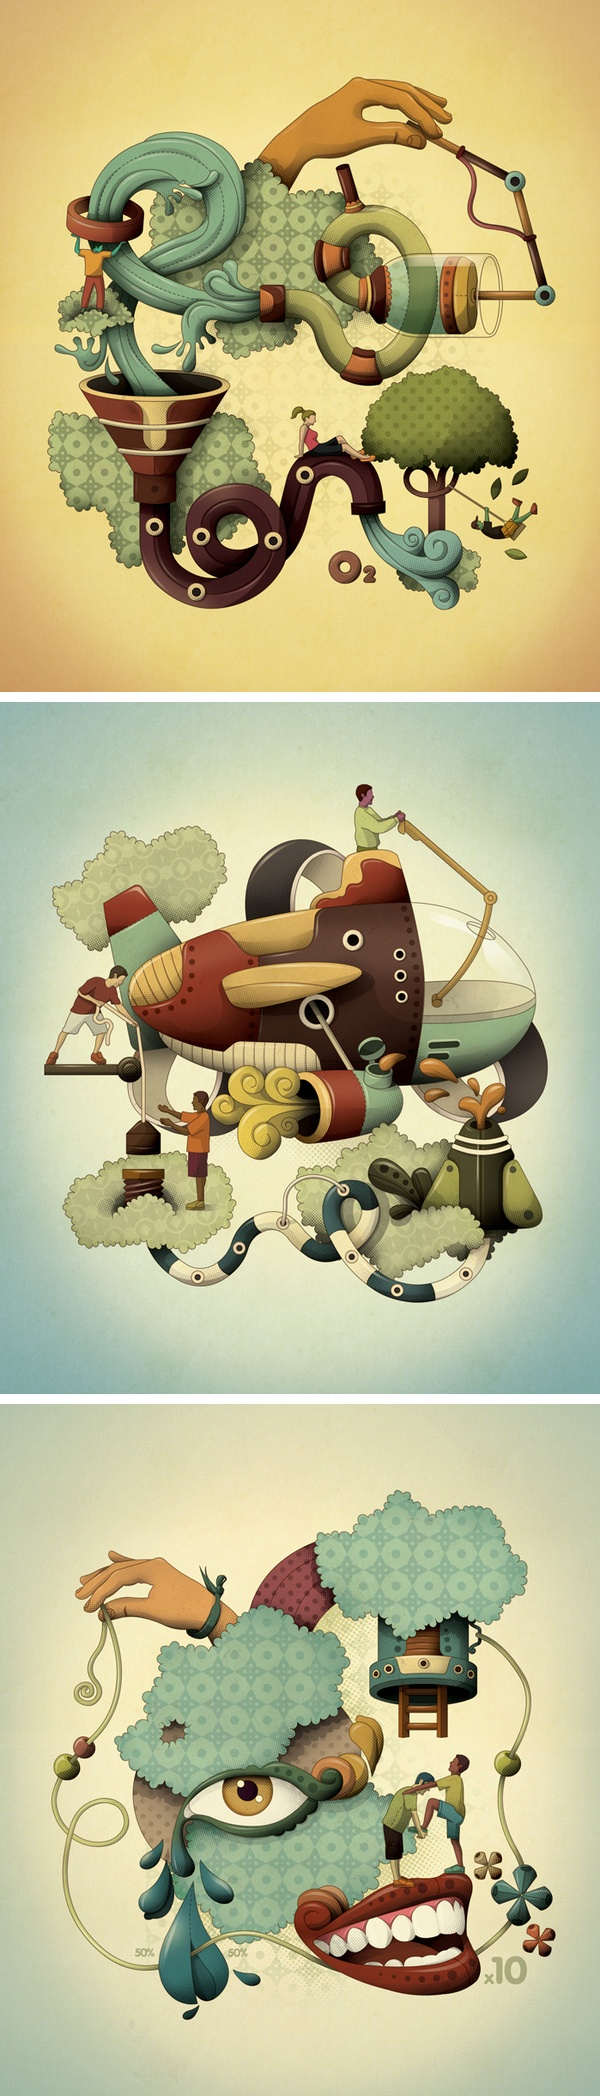 Illustration portfolio by Leandro Lima